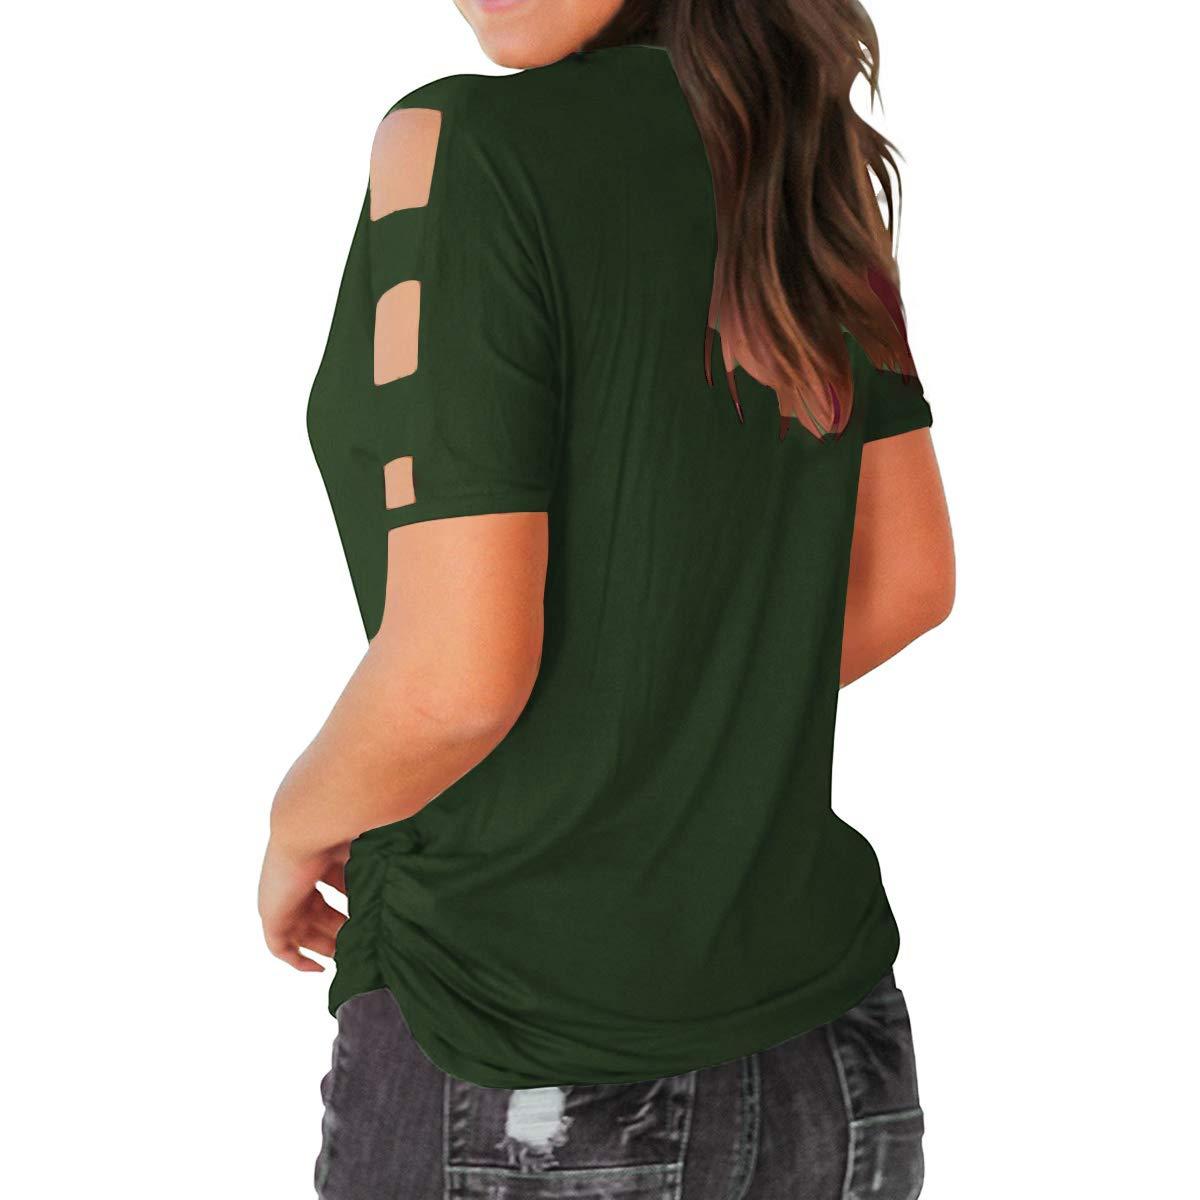 Eanklosco Womens Summer Short Sleeve Cold Shoulder Tops V Neck Basic T Shirts (Green, XL)